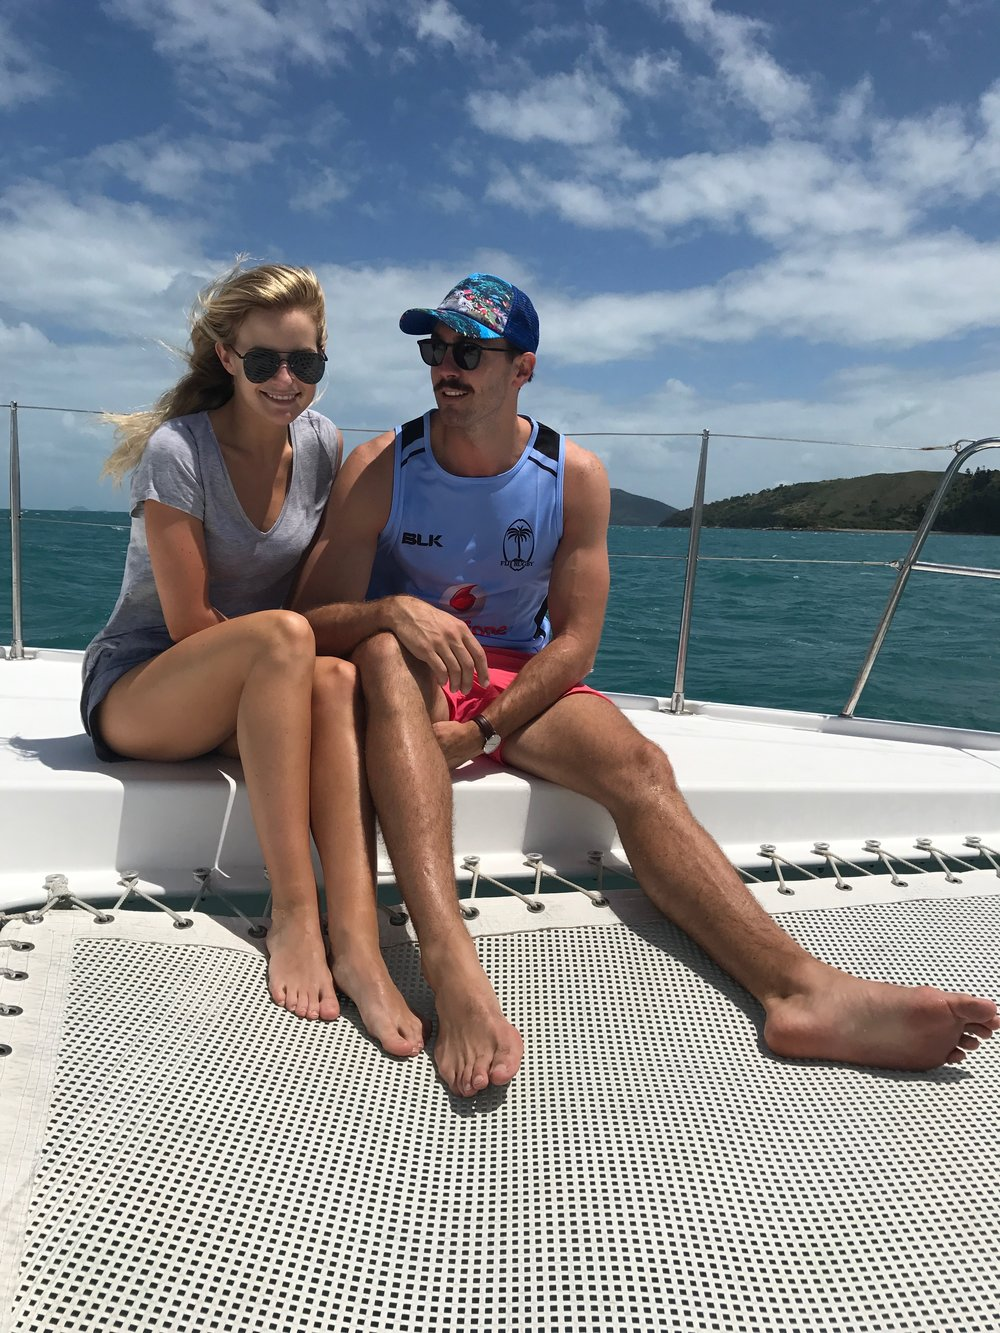 Boating on Hamilton Island